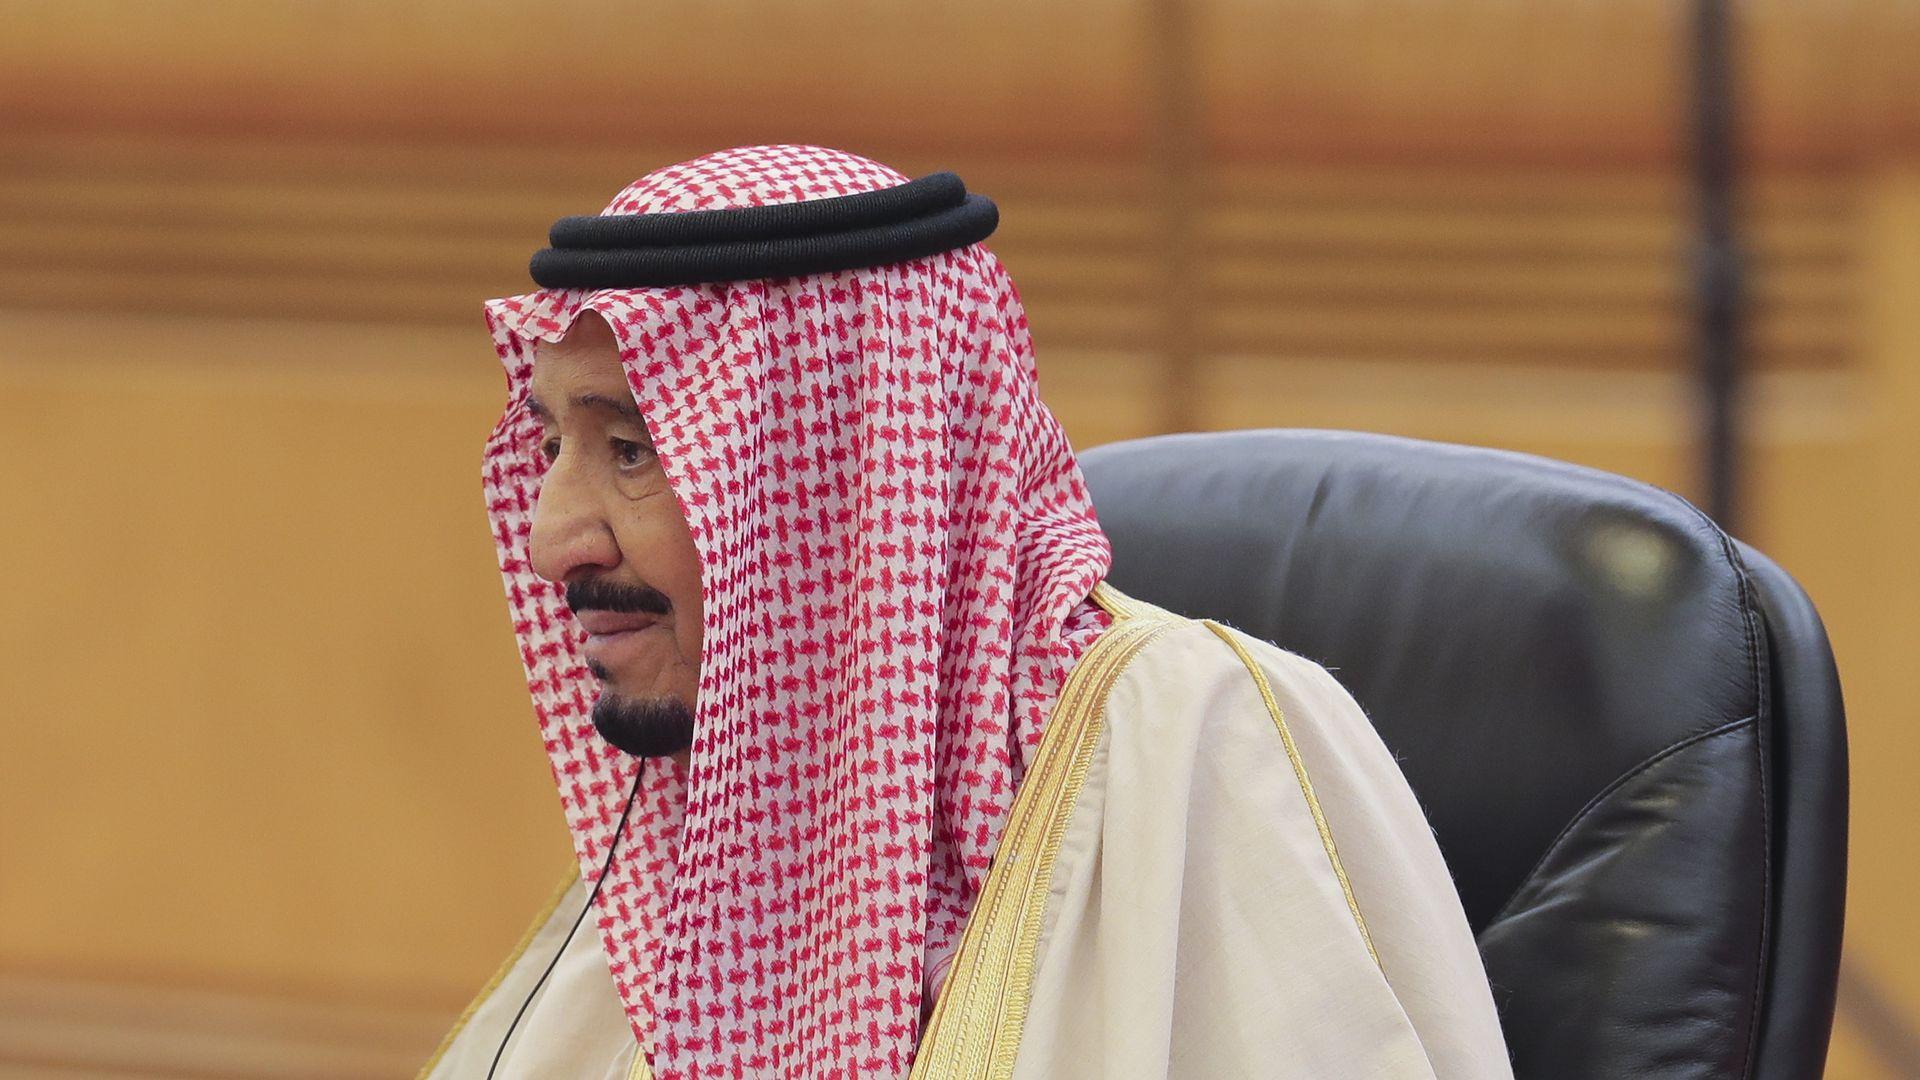 Saudi Arabia's King Salman bin Abdulaziz Al Saud.